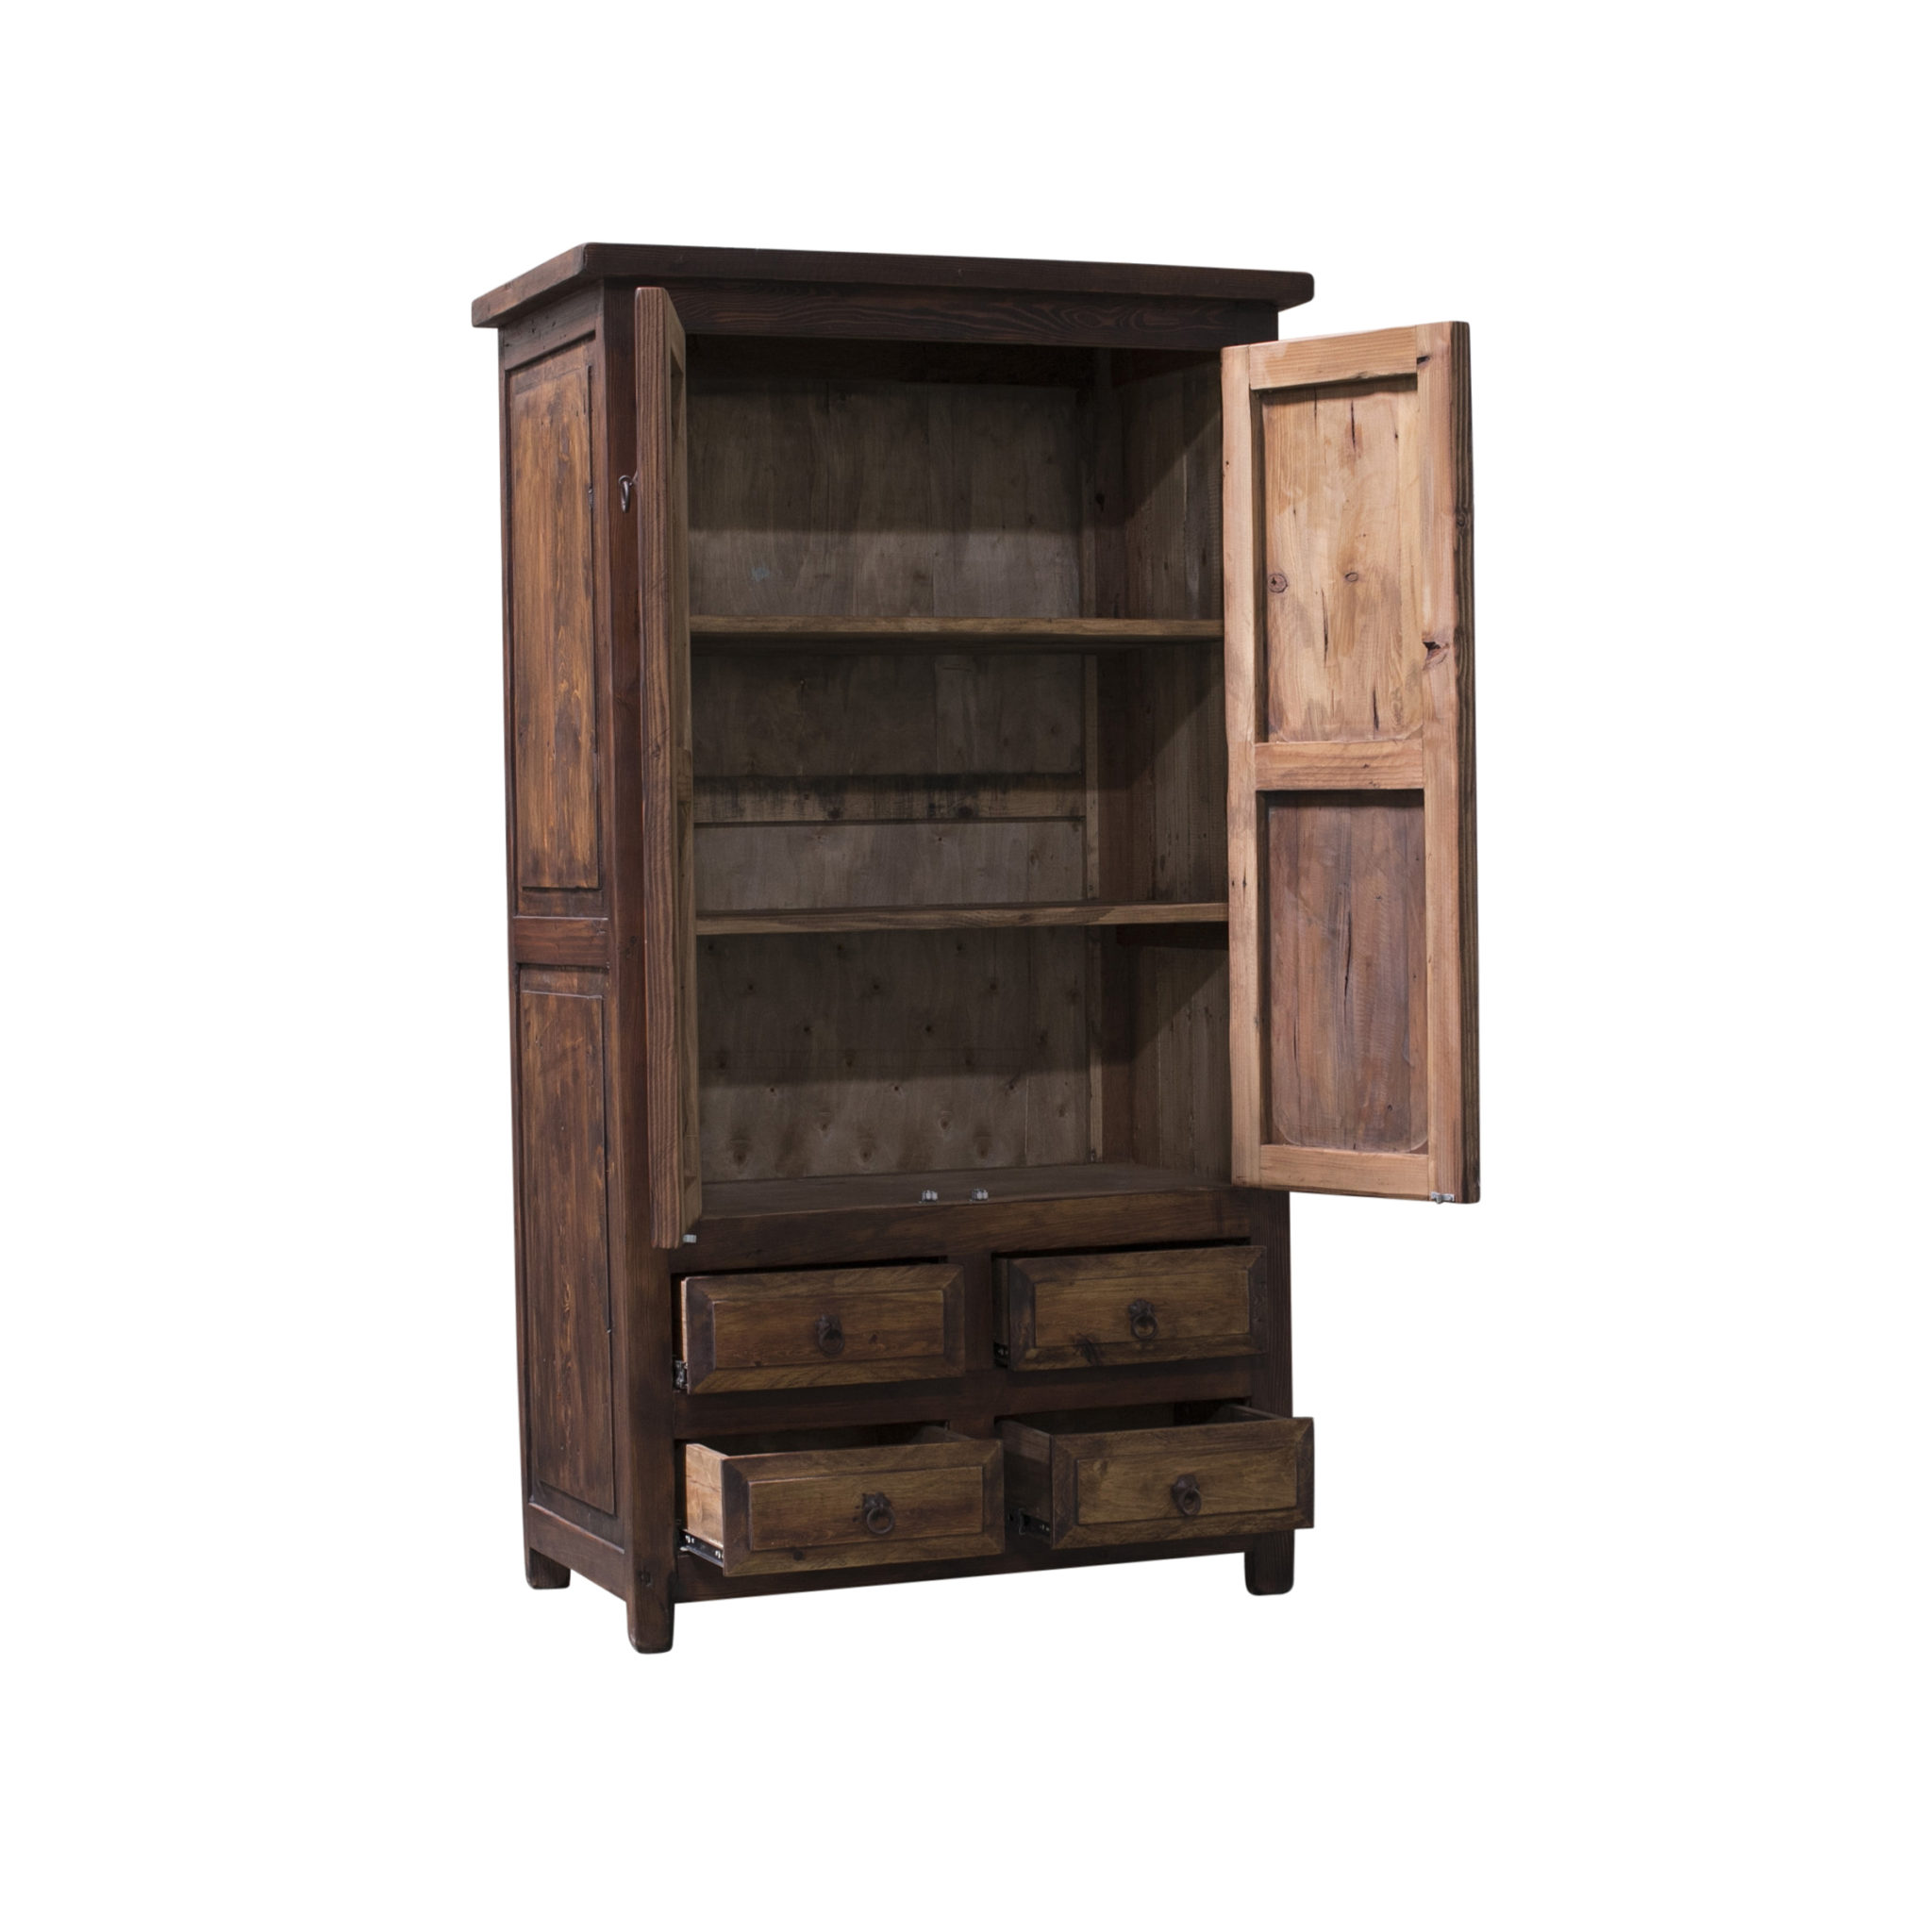 Hemingway Grand Rustic Linen Cabinet